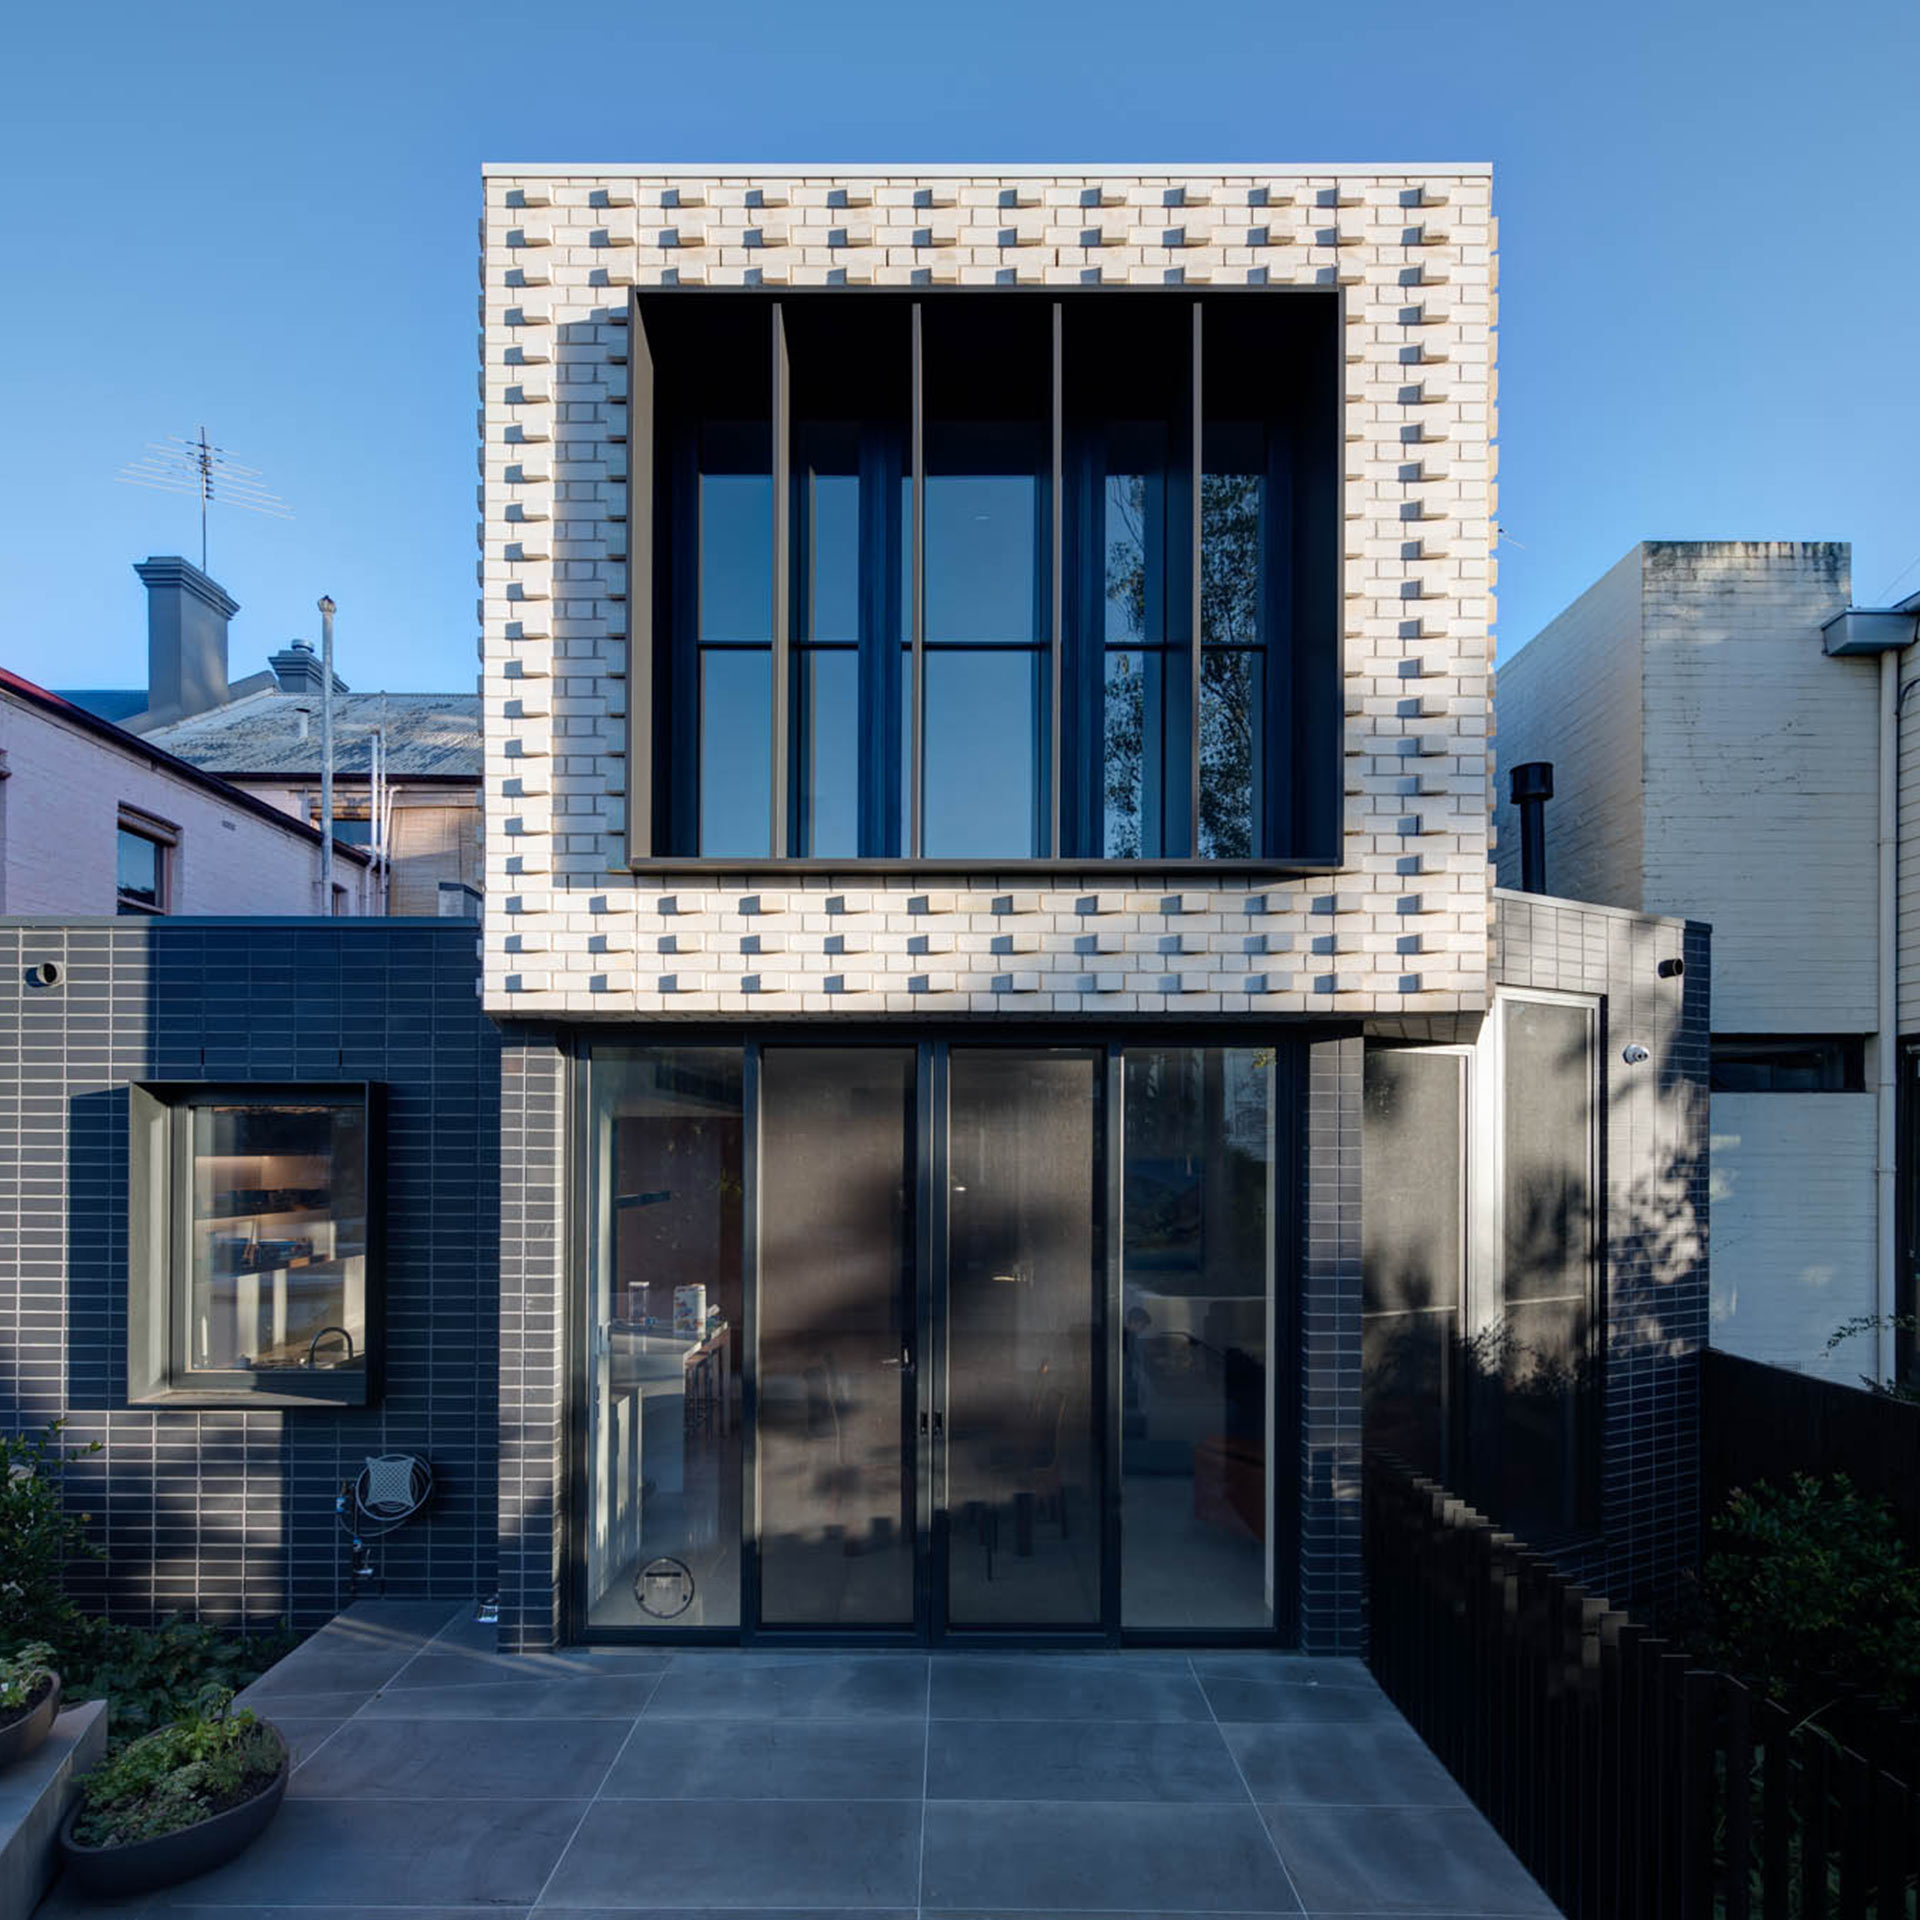 https://jamarchitects.com.au/wp-content/uploads/2021/07/JAM-Projects-GatehouseSt01a-1920x1920-1.jpg